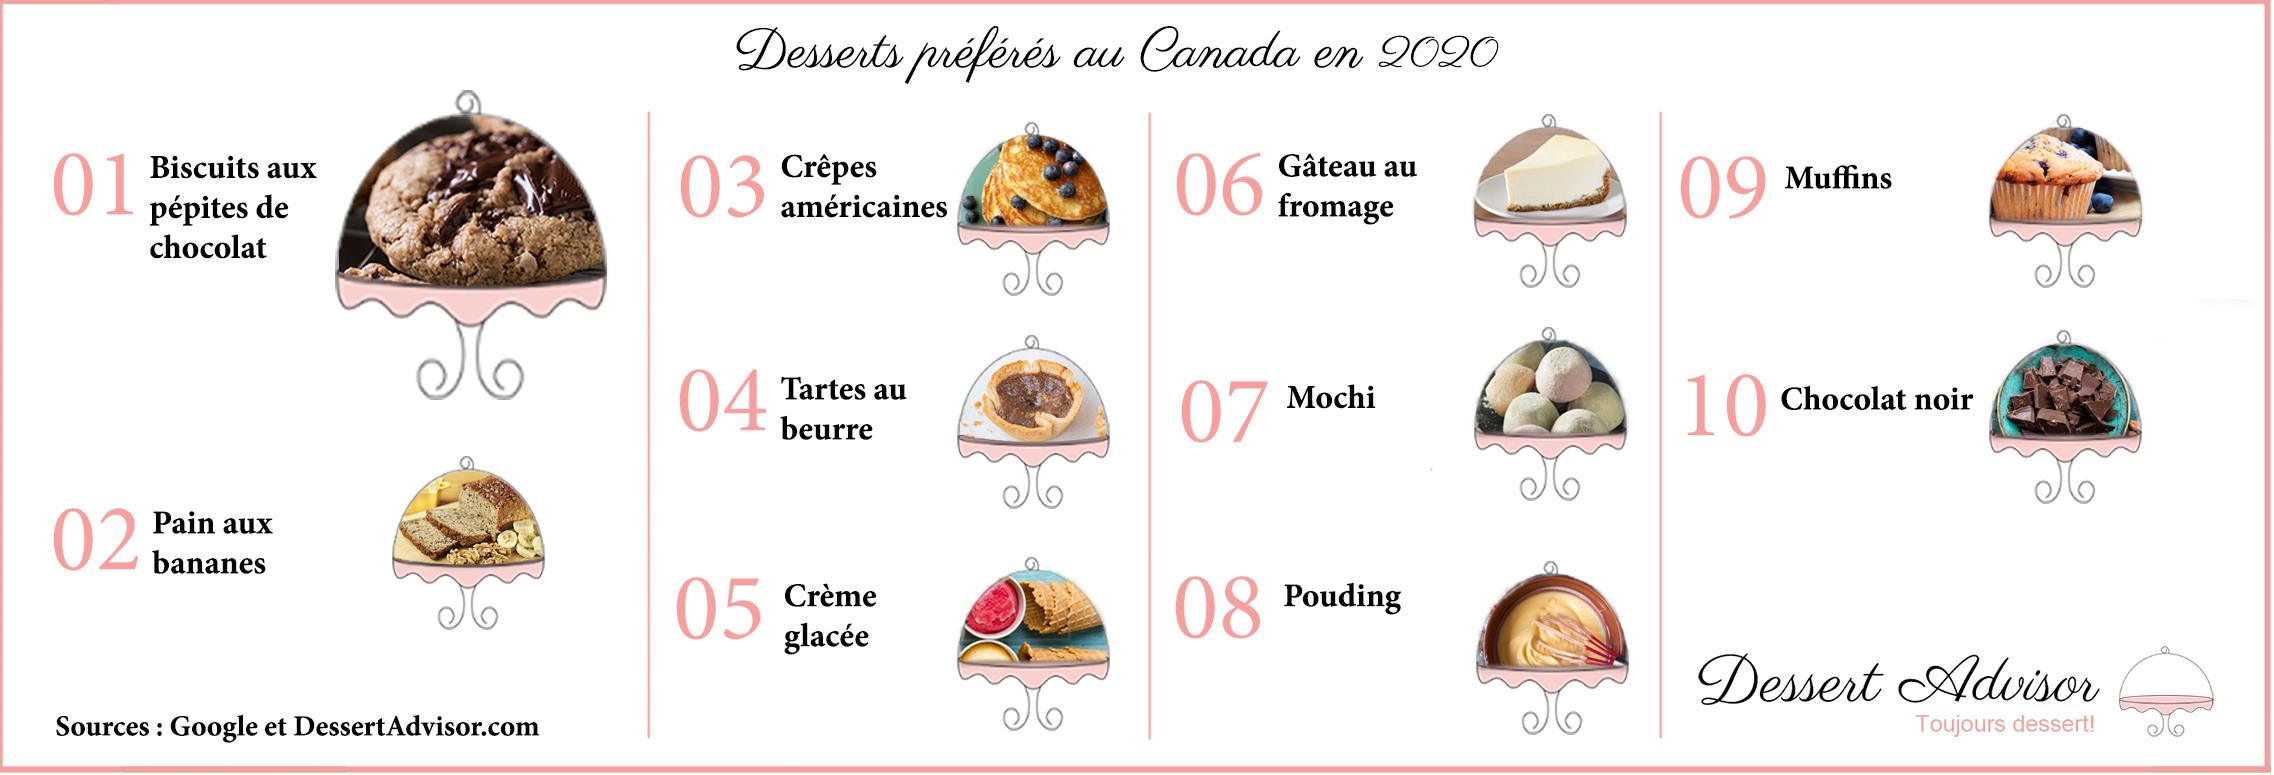 Dessert Advisor Top Desserts in Canada Blog Image. Image du Blog des desserts préférés au Canada. 2